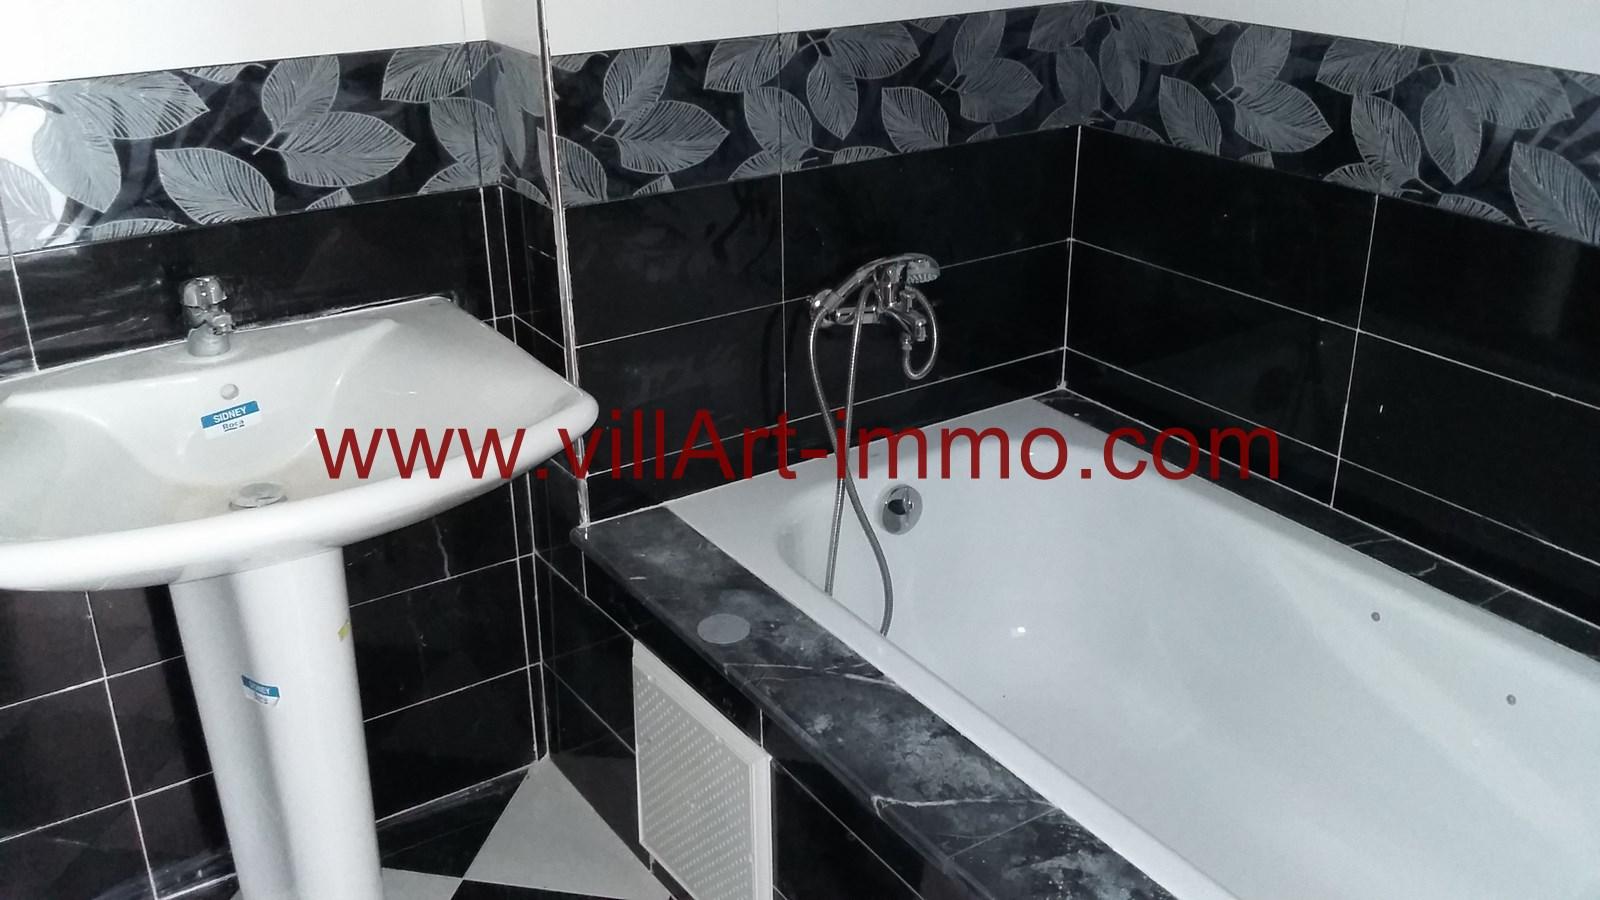 9-a-louer-appartement-non-meuble-tanger-salle-de-bain-2-l881-villart-immo